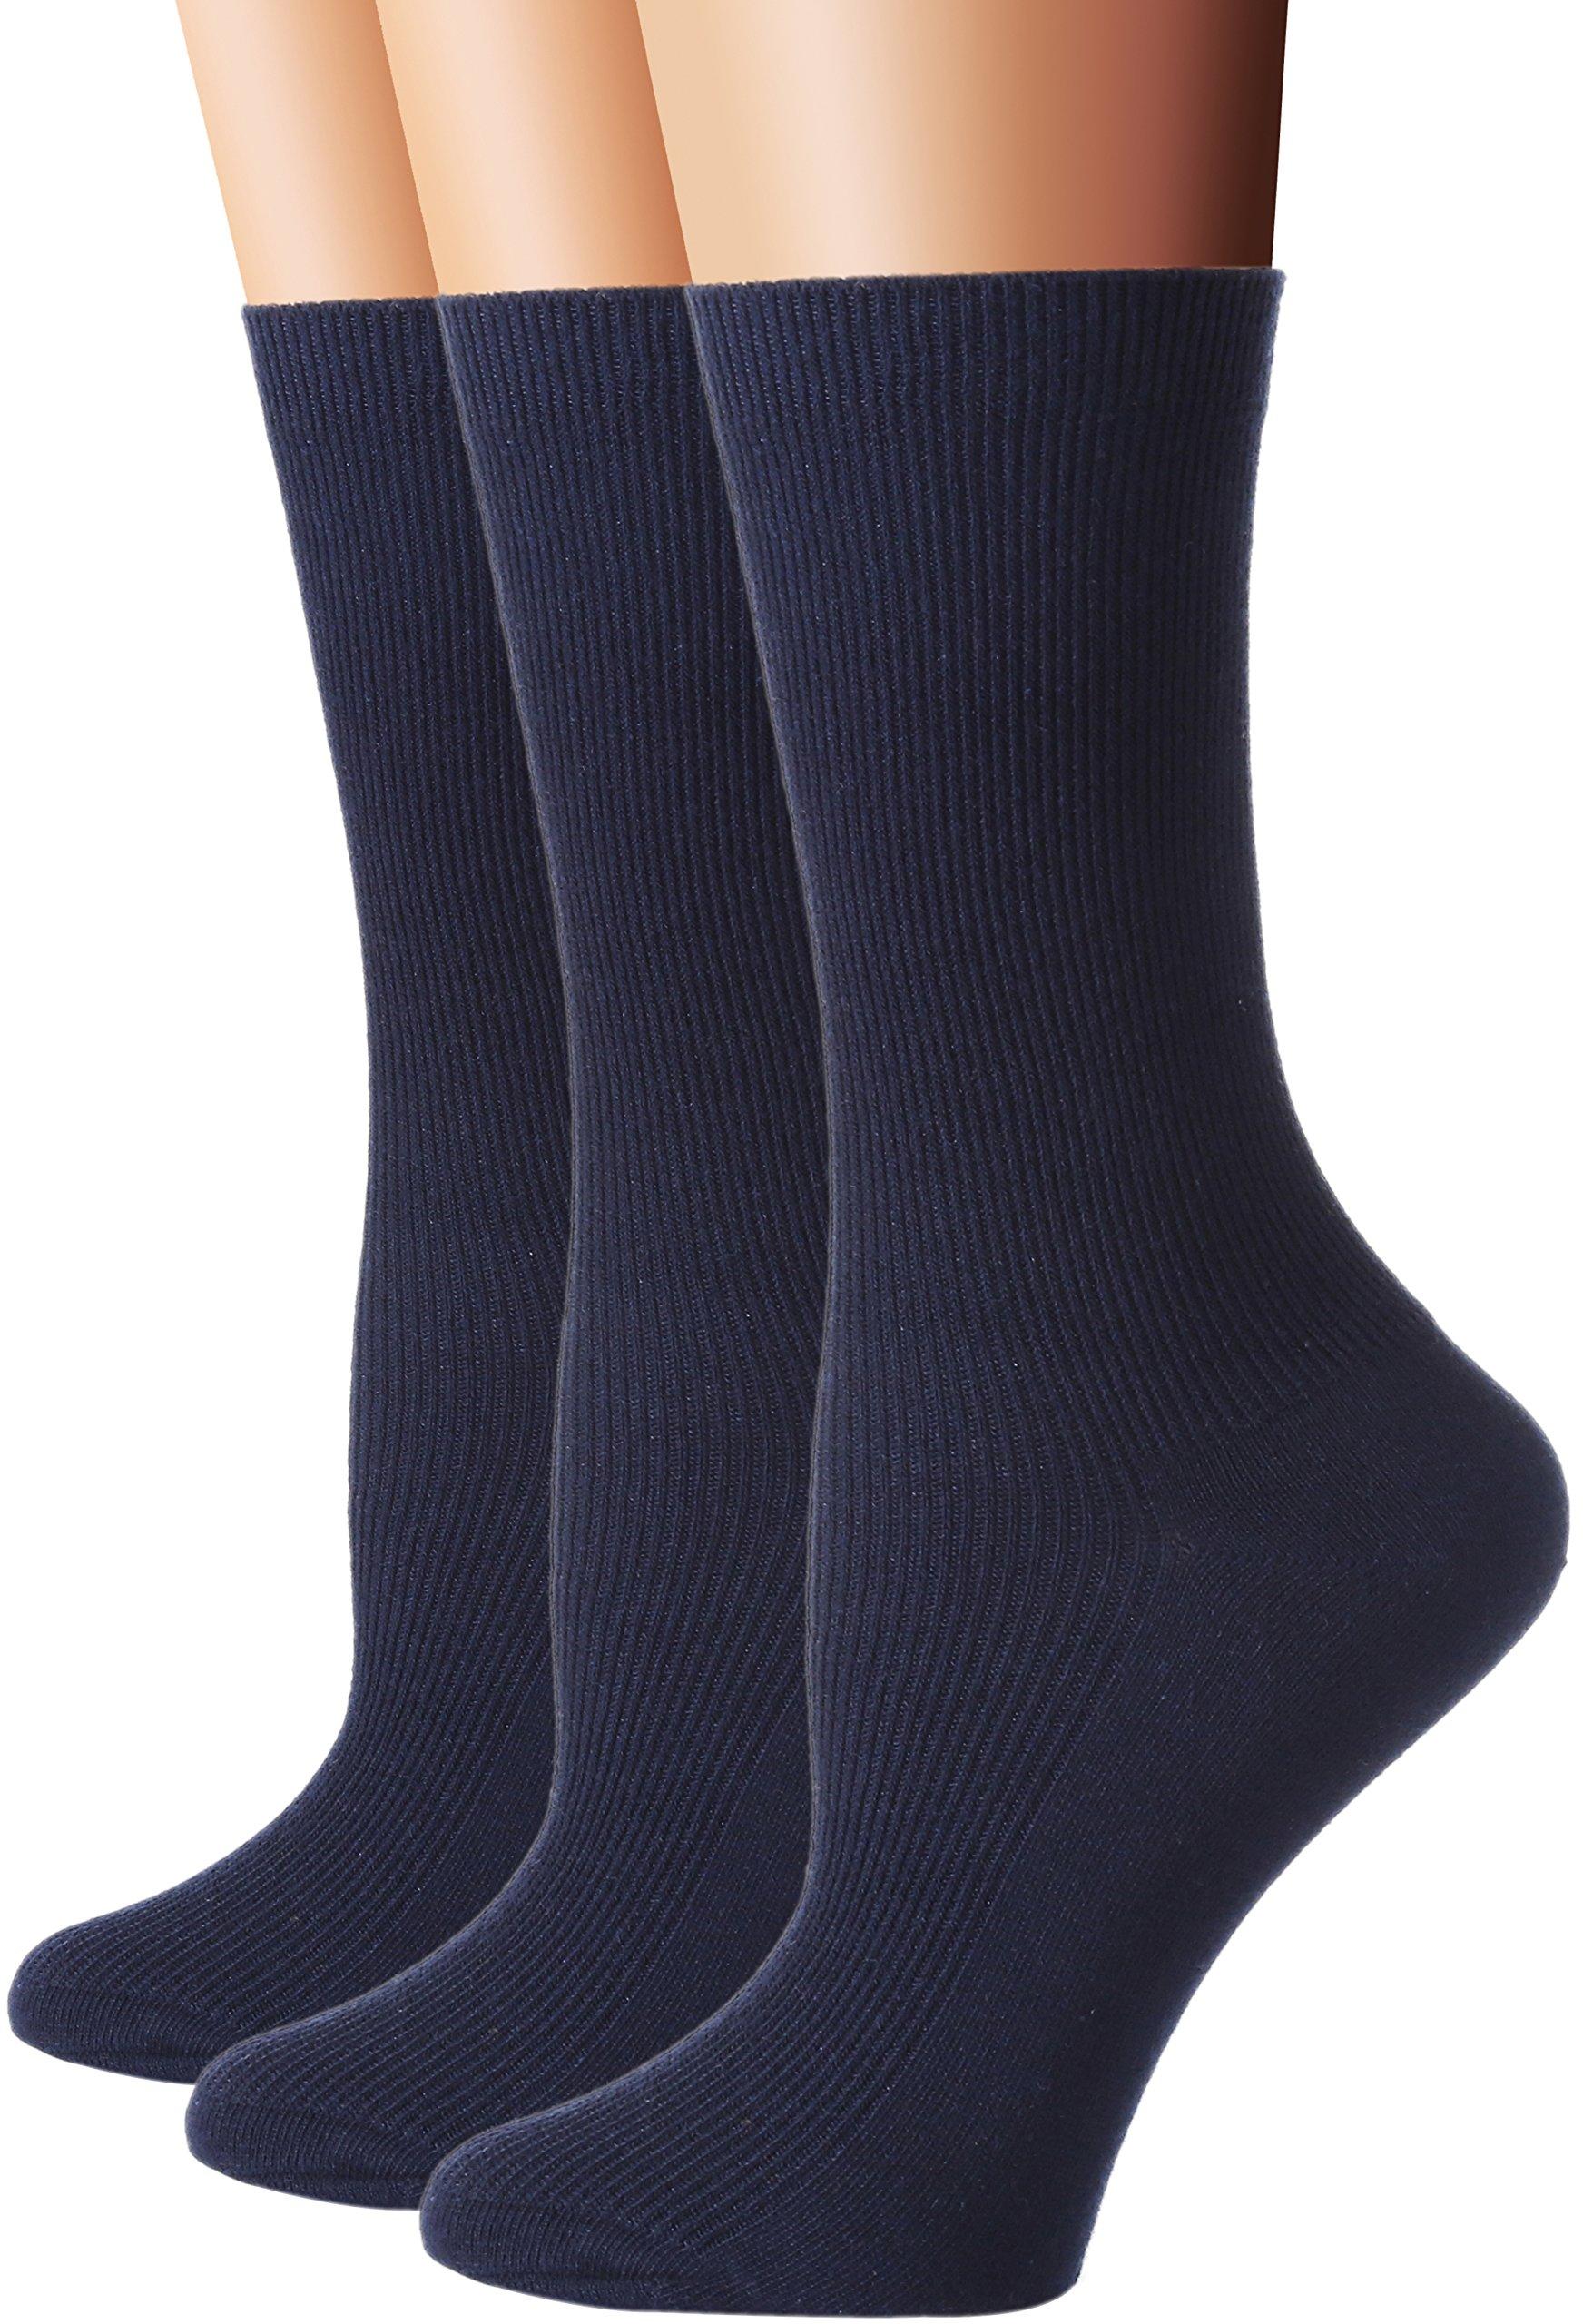 Flora&Fred Women's 3 Pair Pack Cotton Crew Socks Navy, Shoe Size 5-9